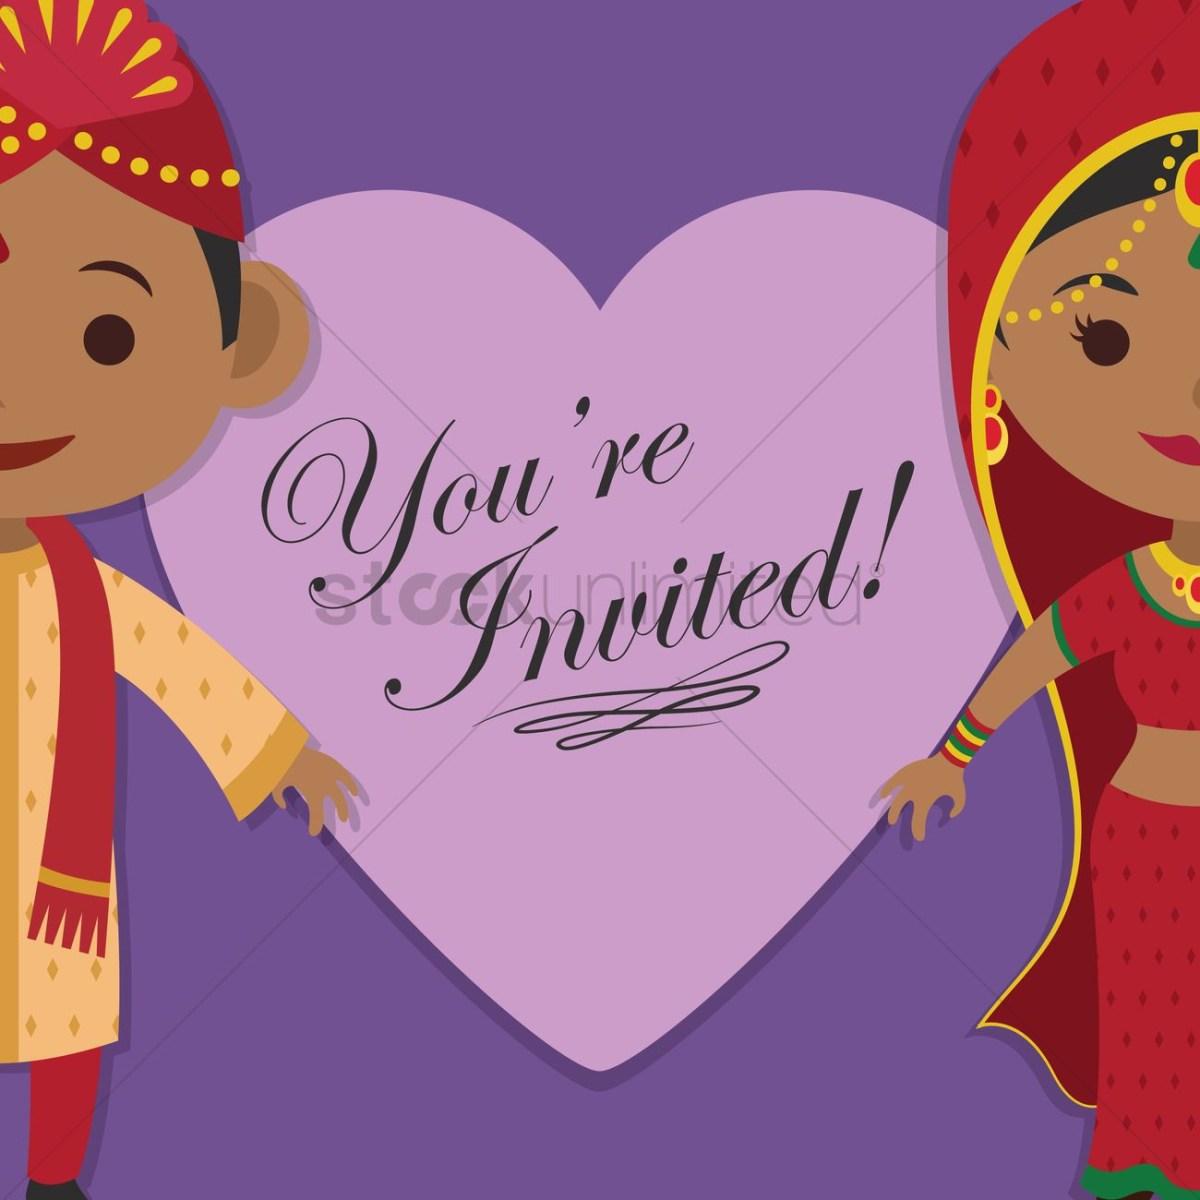 Indian Wedding Invitation Indian Wedding Invitation Vector Image 1244217 Stockunlimited